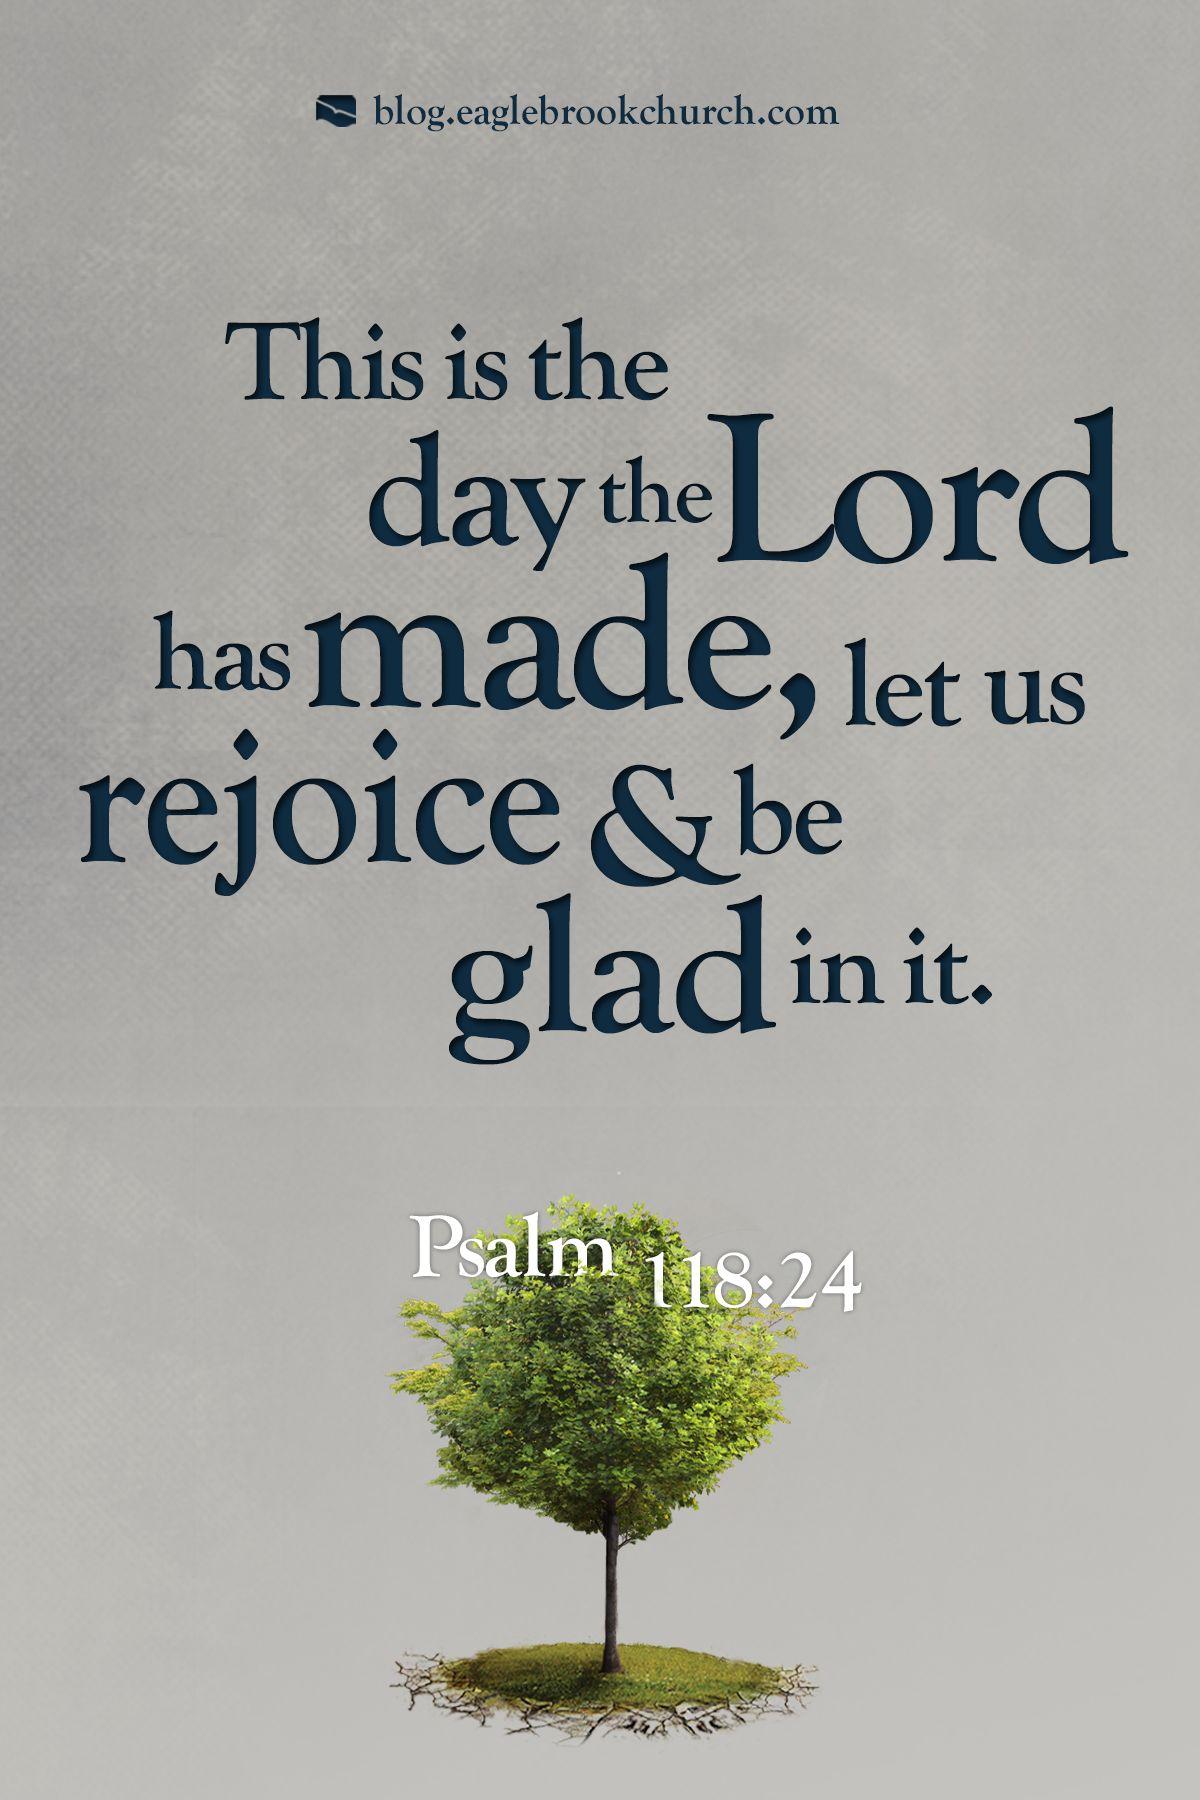 Lesson 22: The Choice to Rejoice (Philippians 4:4)